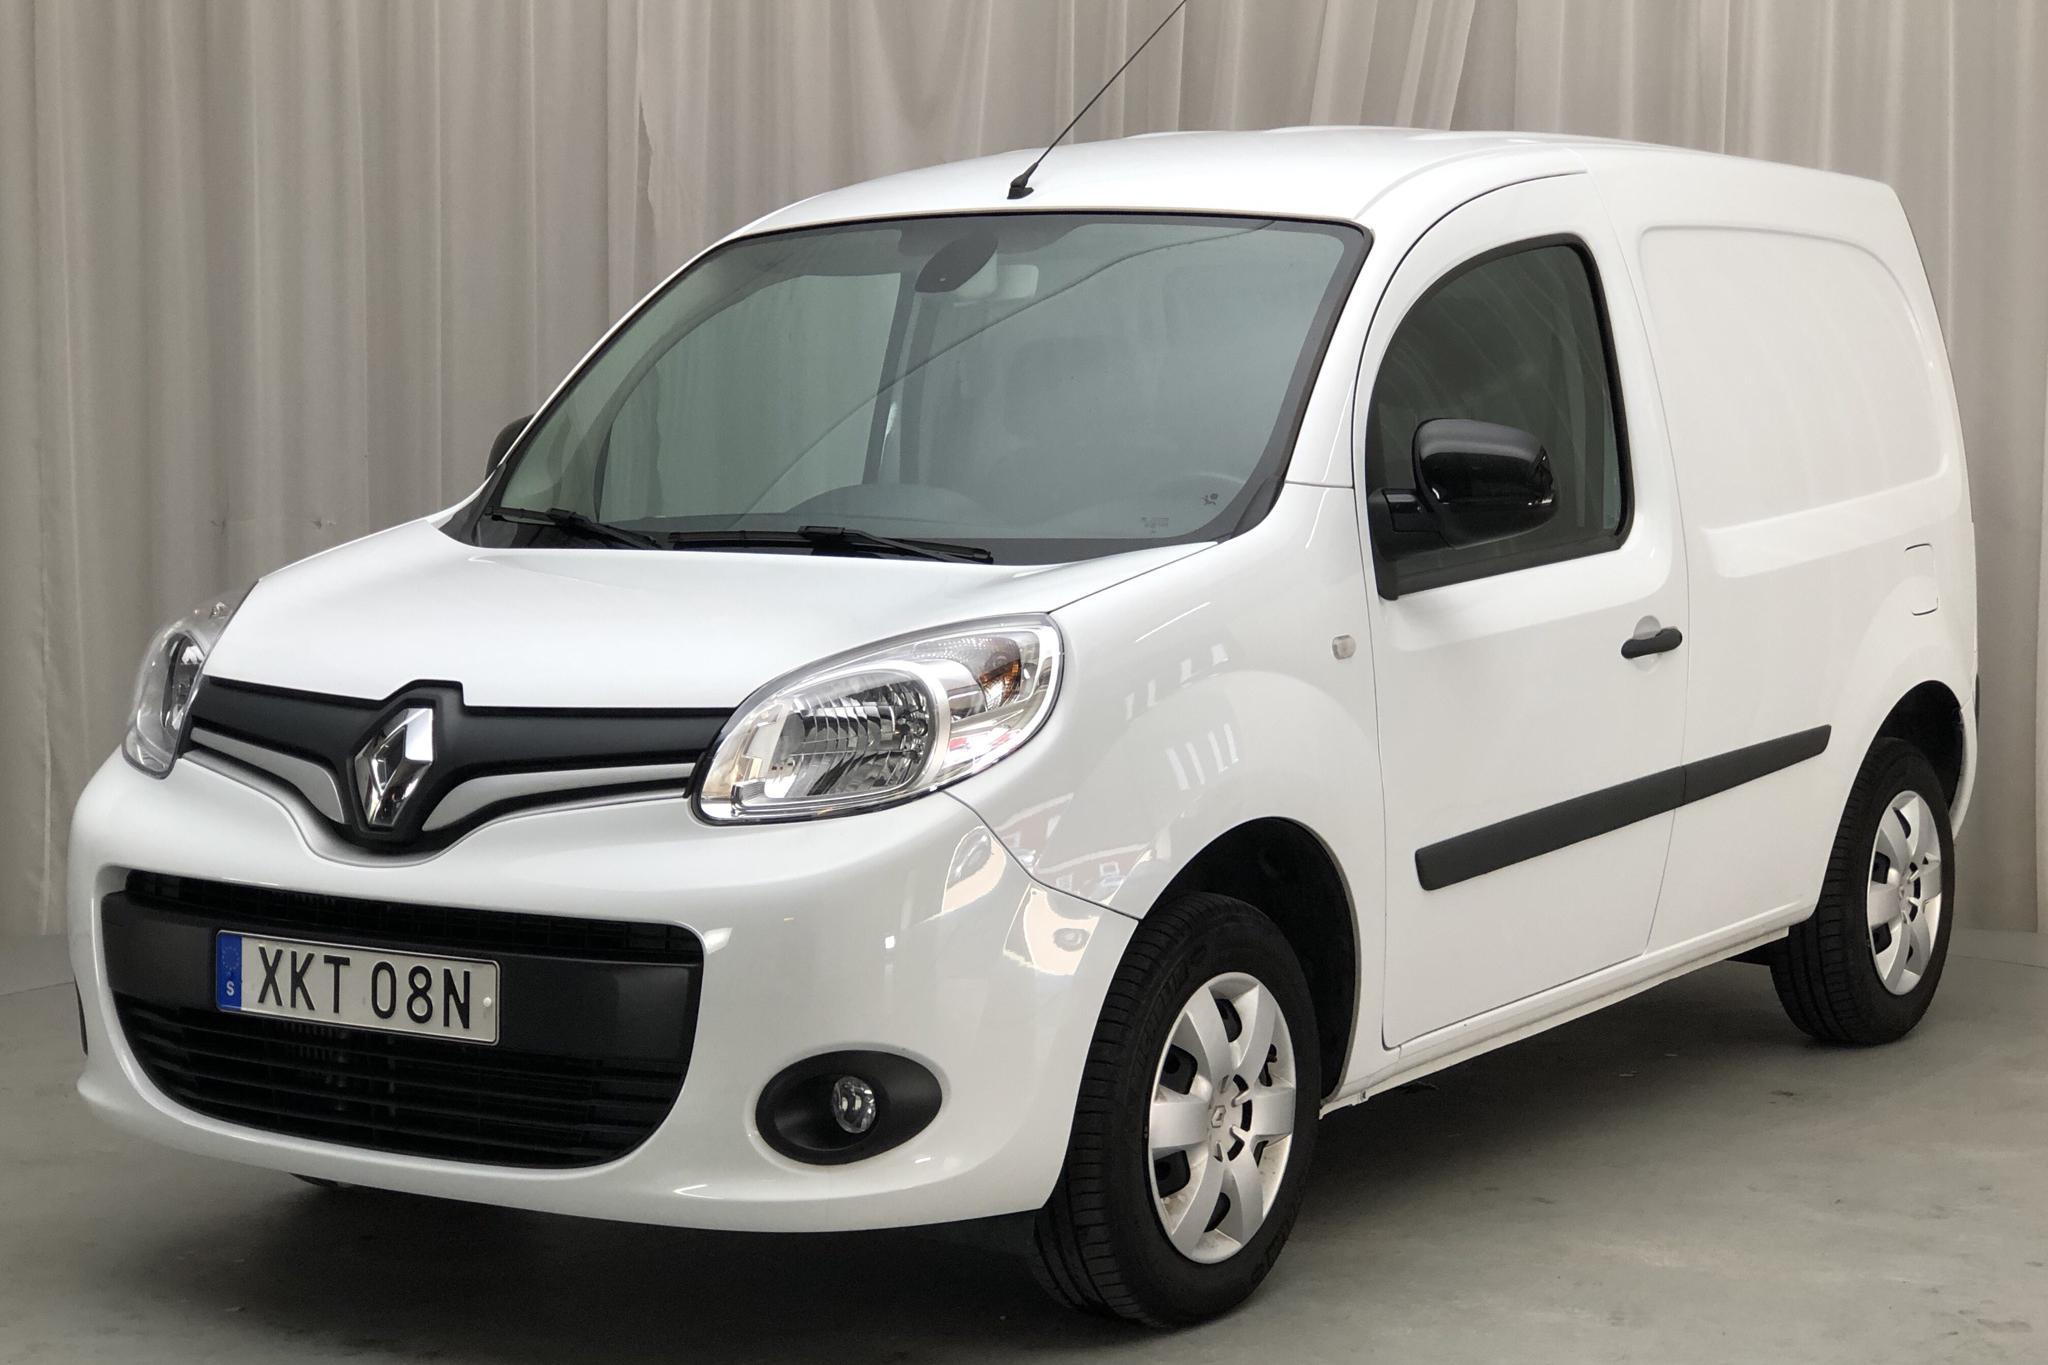 Renault Kangoo 1.5 dCi Express Maxi (90hk) - 33 550 km - Automatic - white - 2019